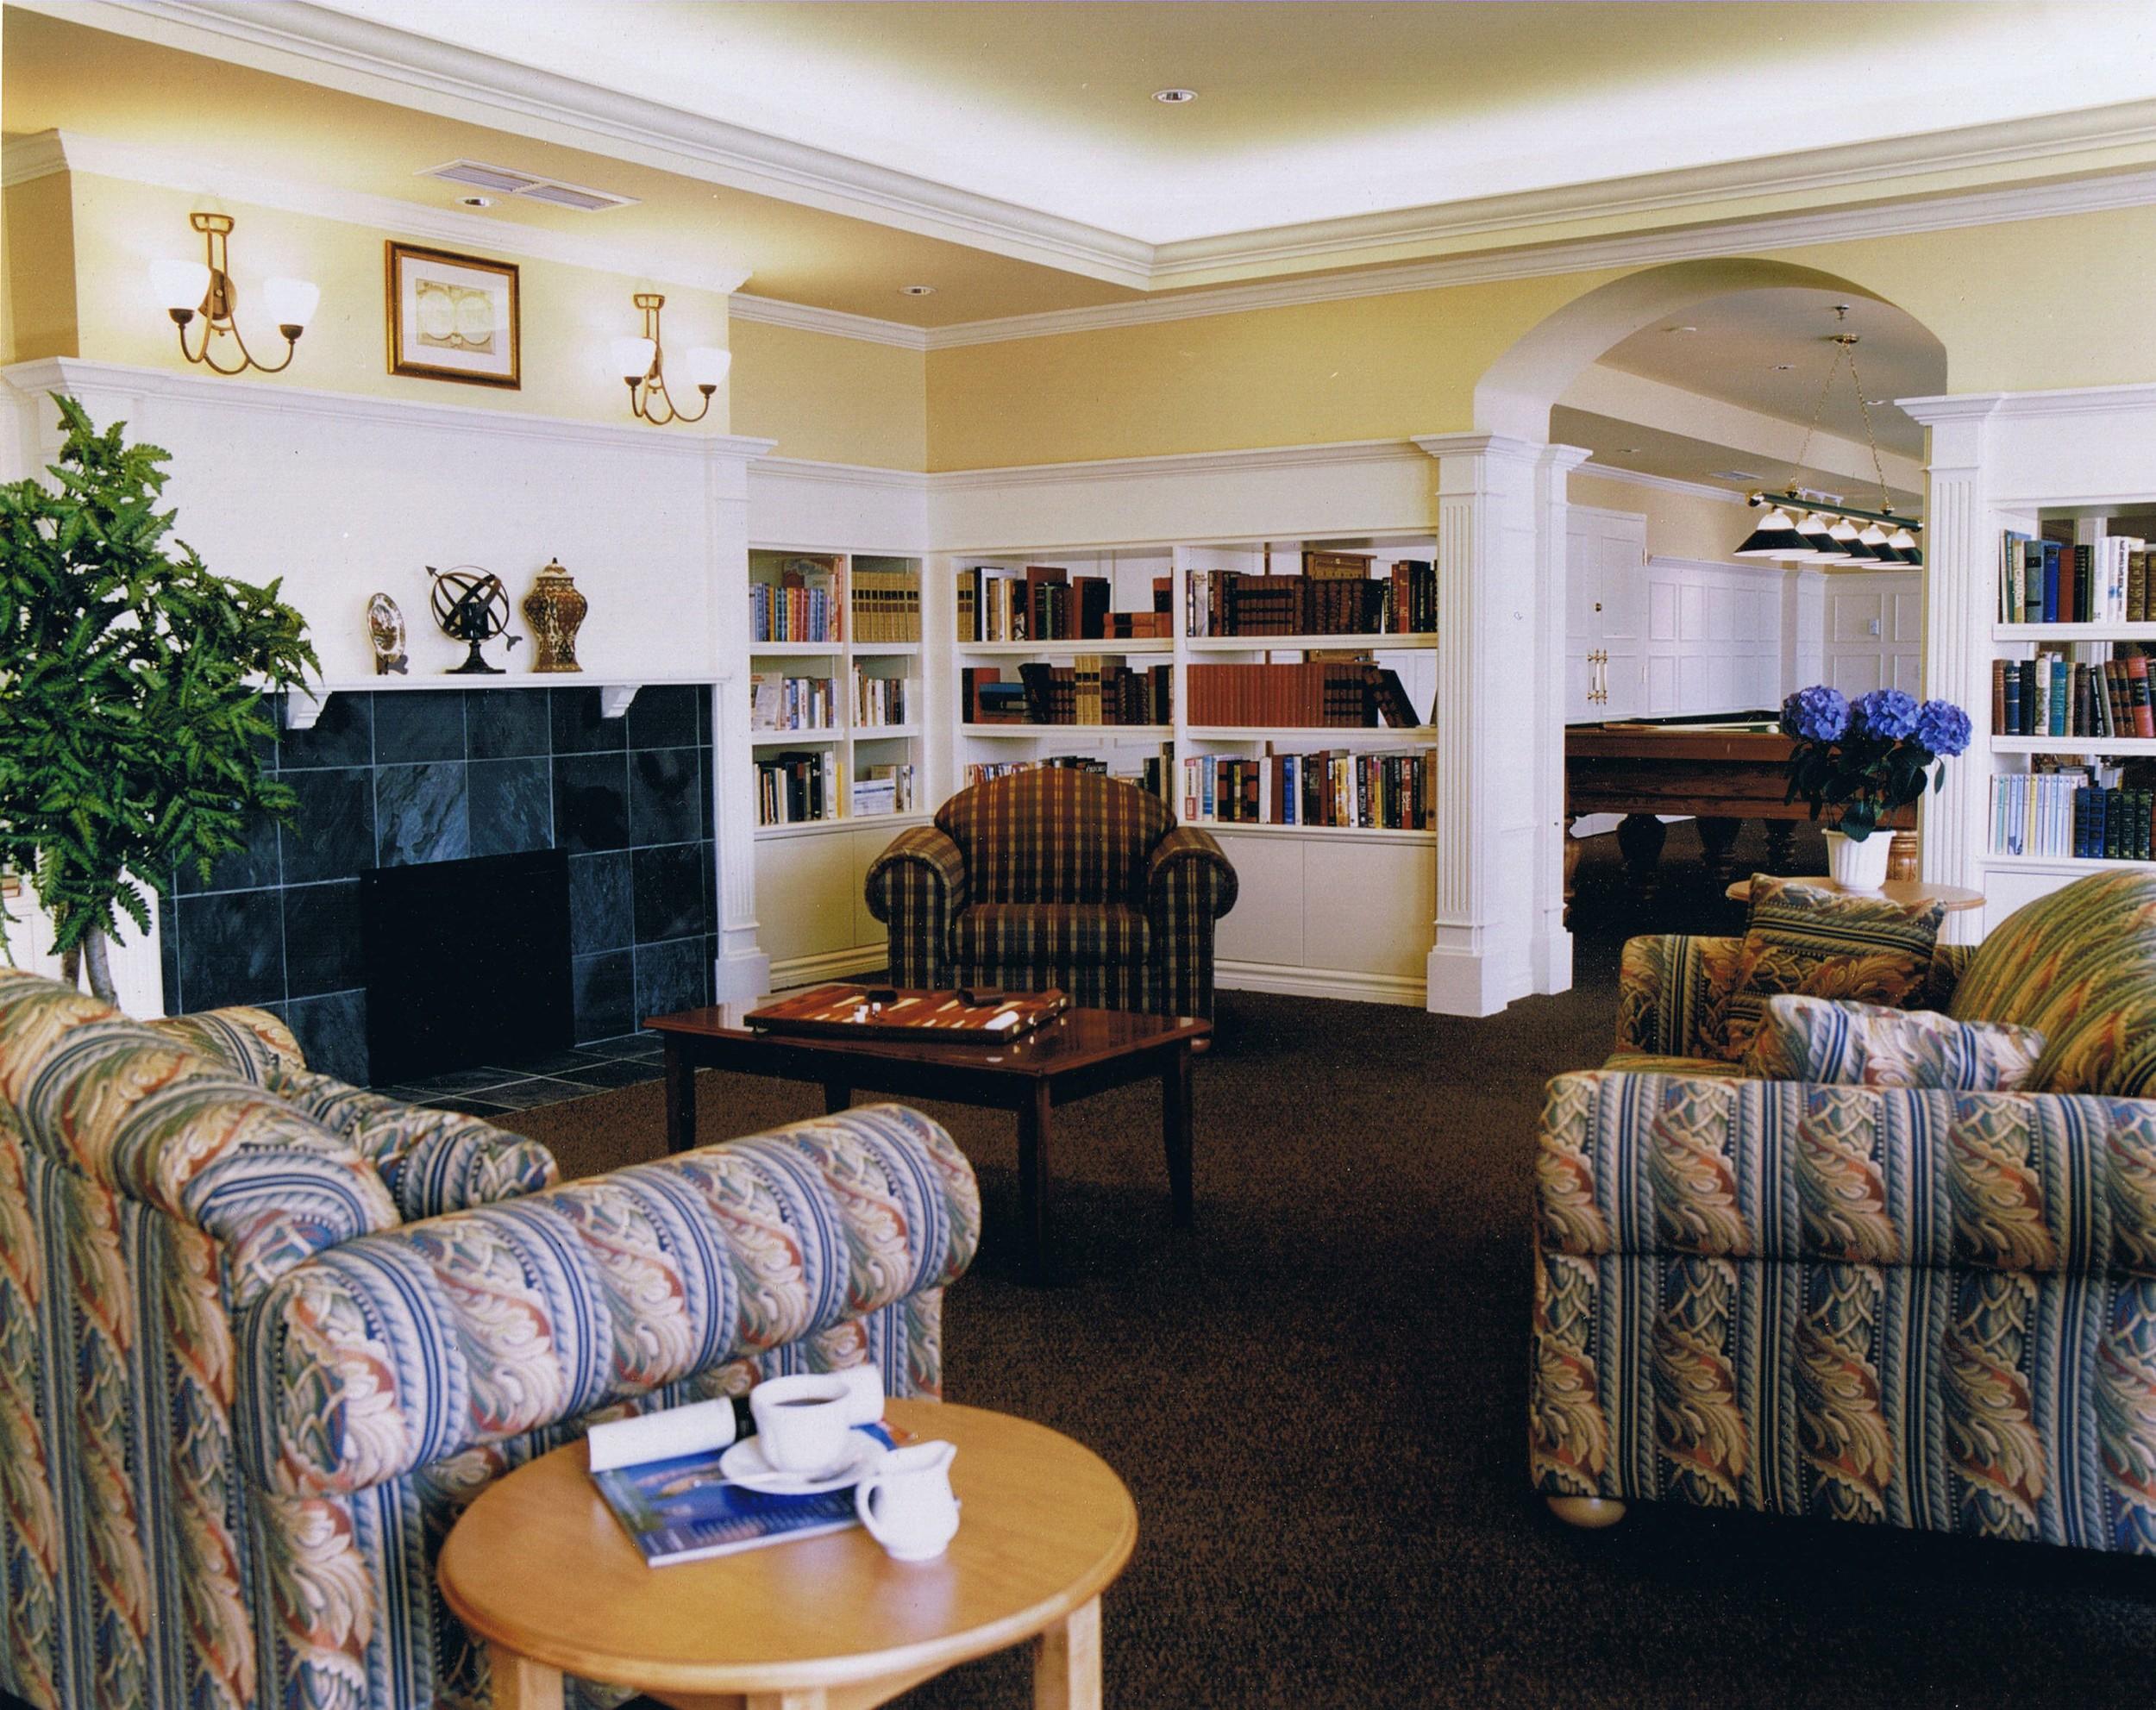 Swan Lake Library, Markham.jpg